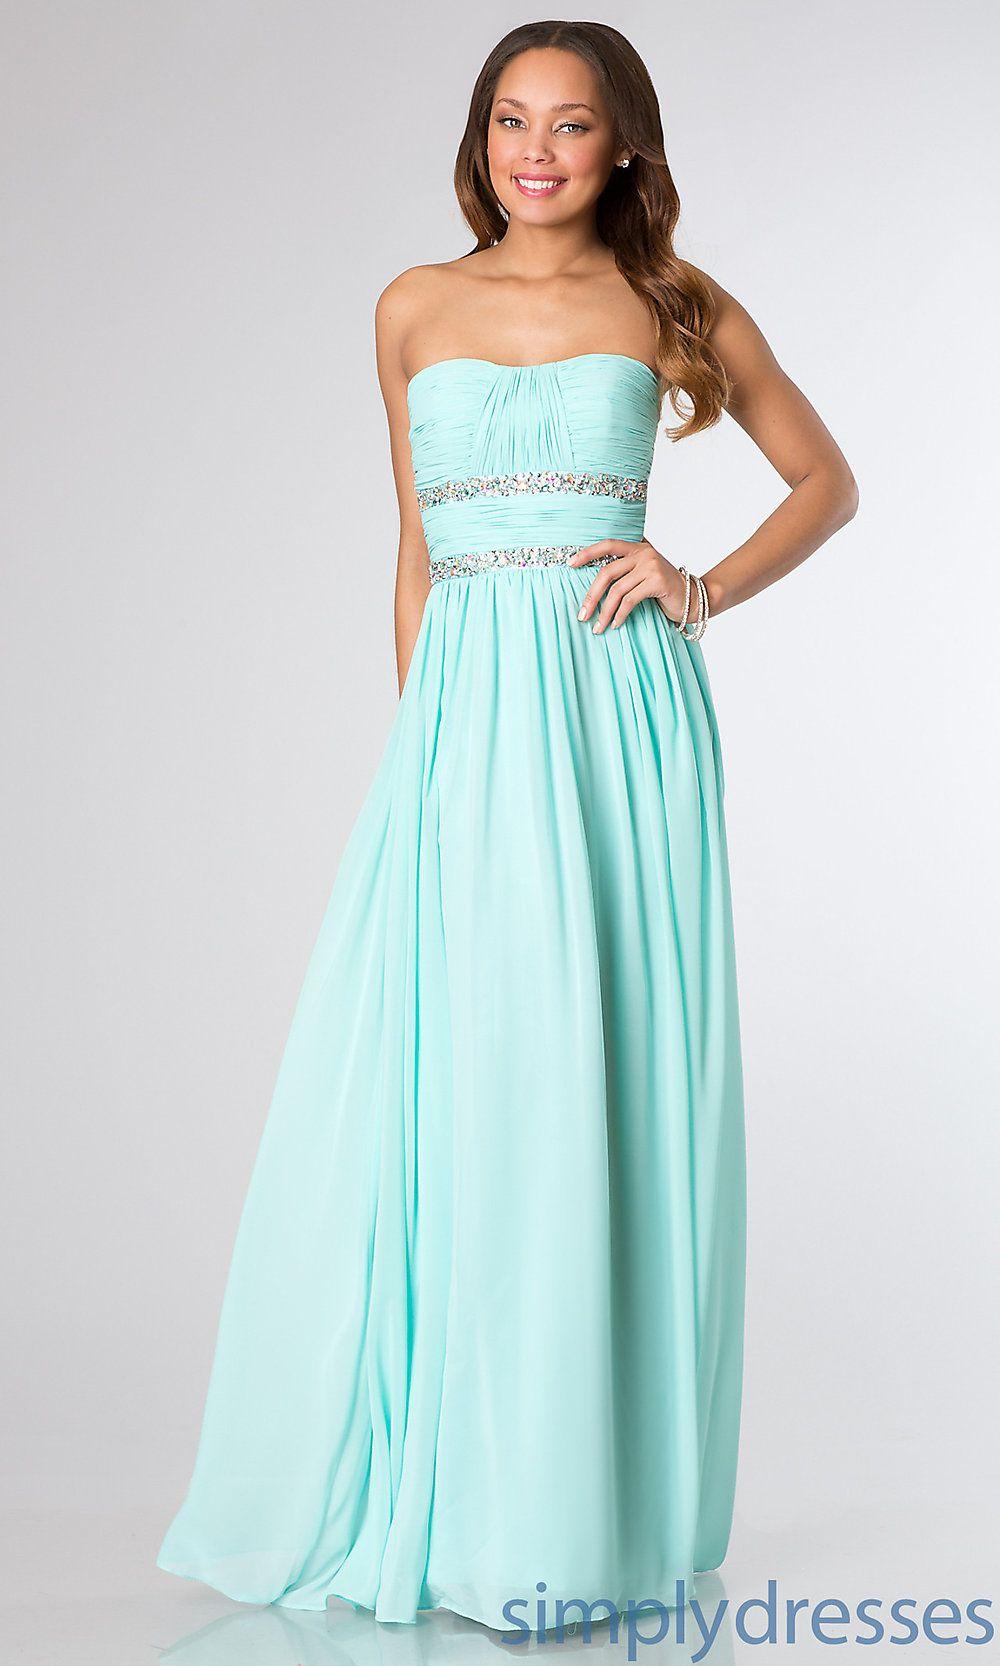 Floor Length Strapless Prom Dress -Simply Dresses | Strapless prom ...